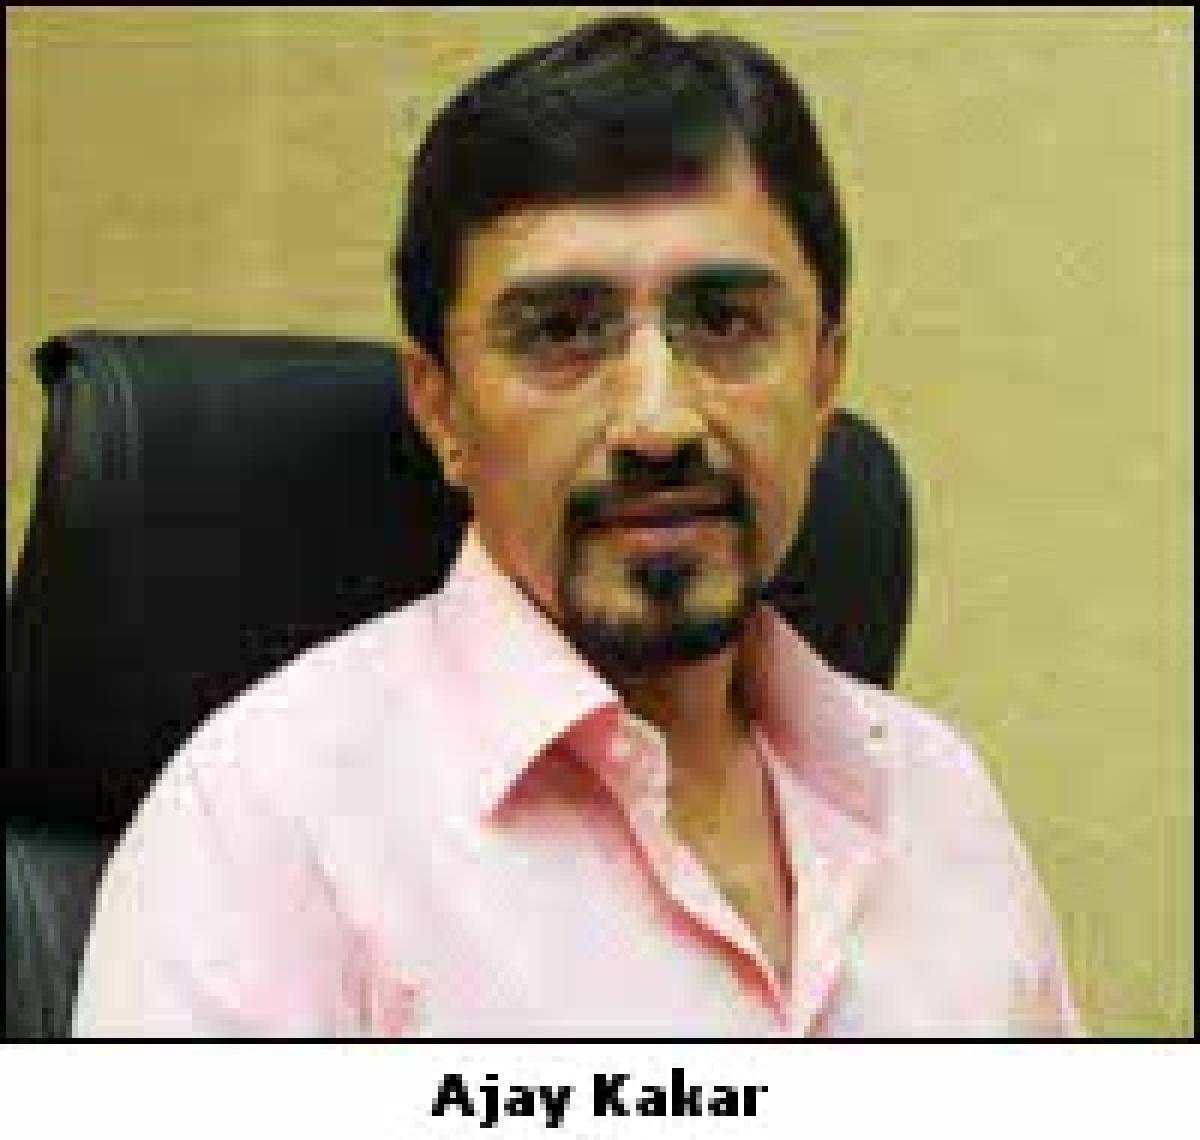 The Ad Club appoints Pratap Bose as president